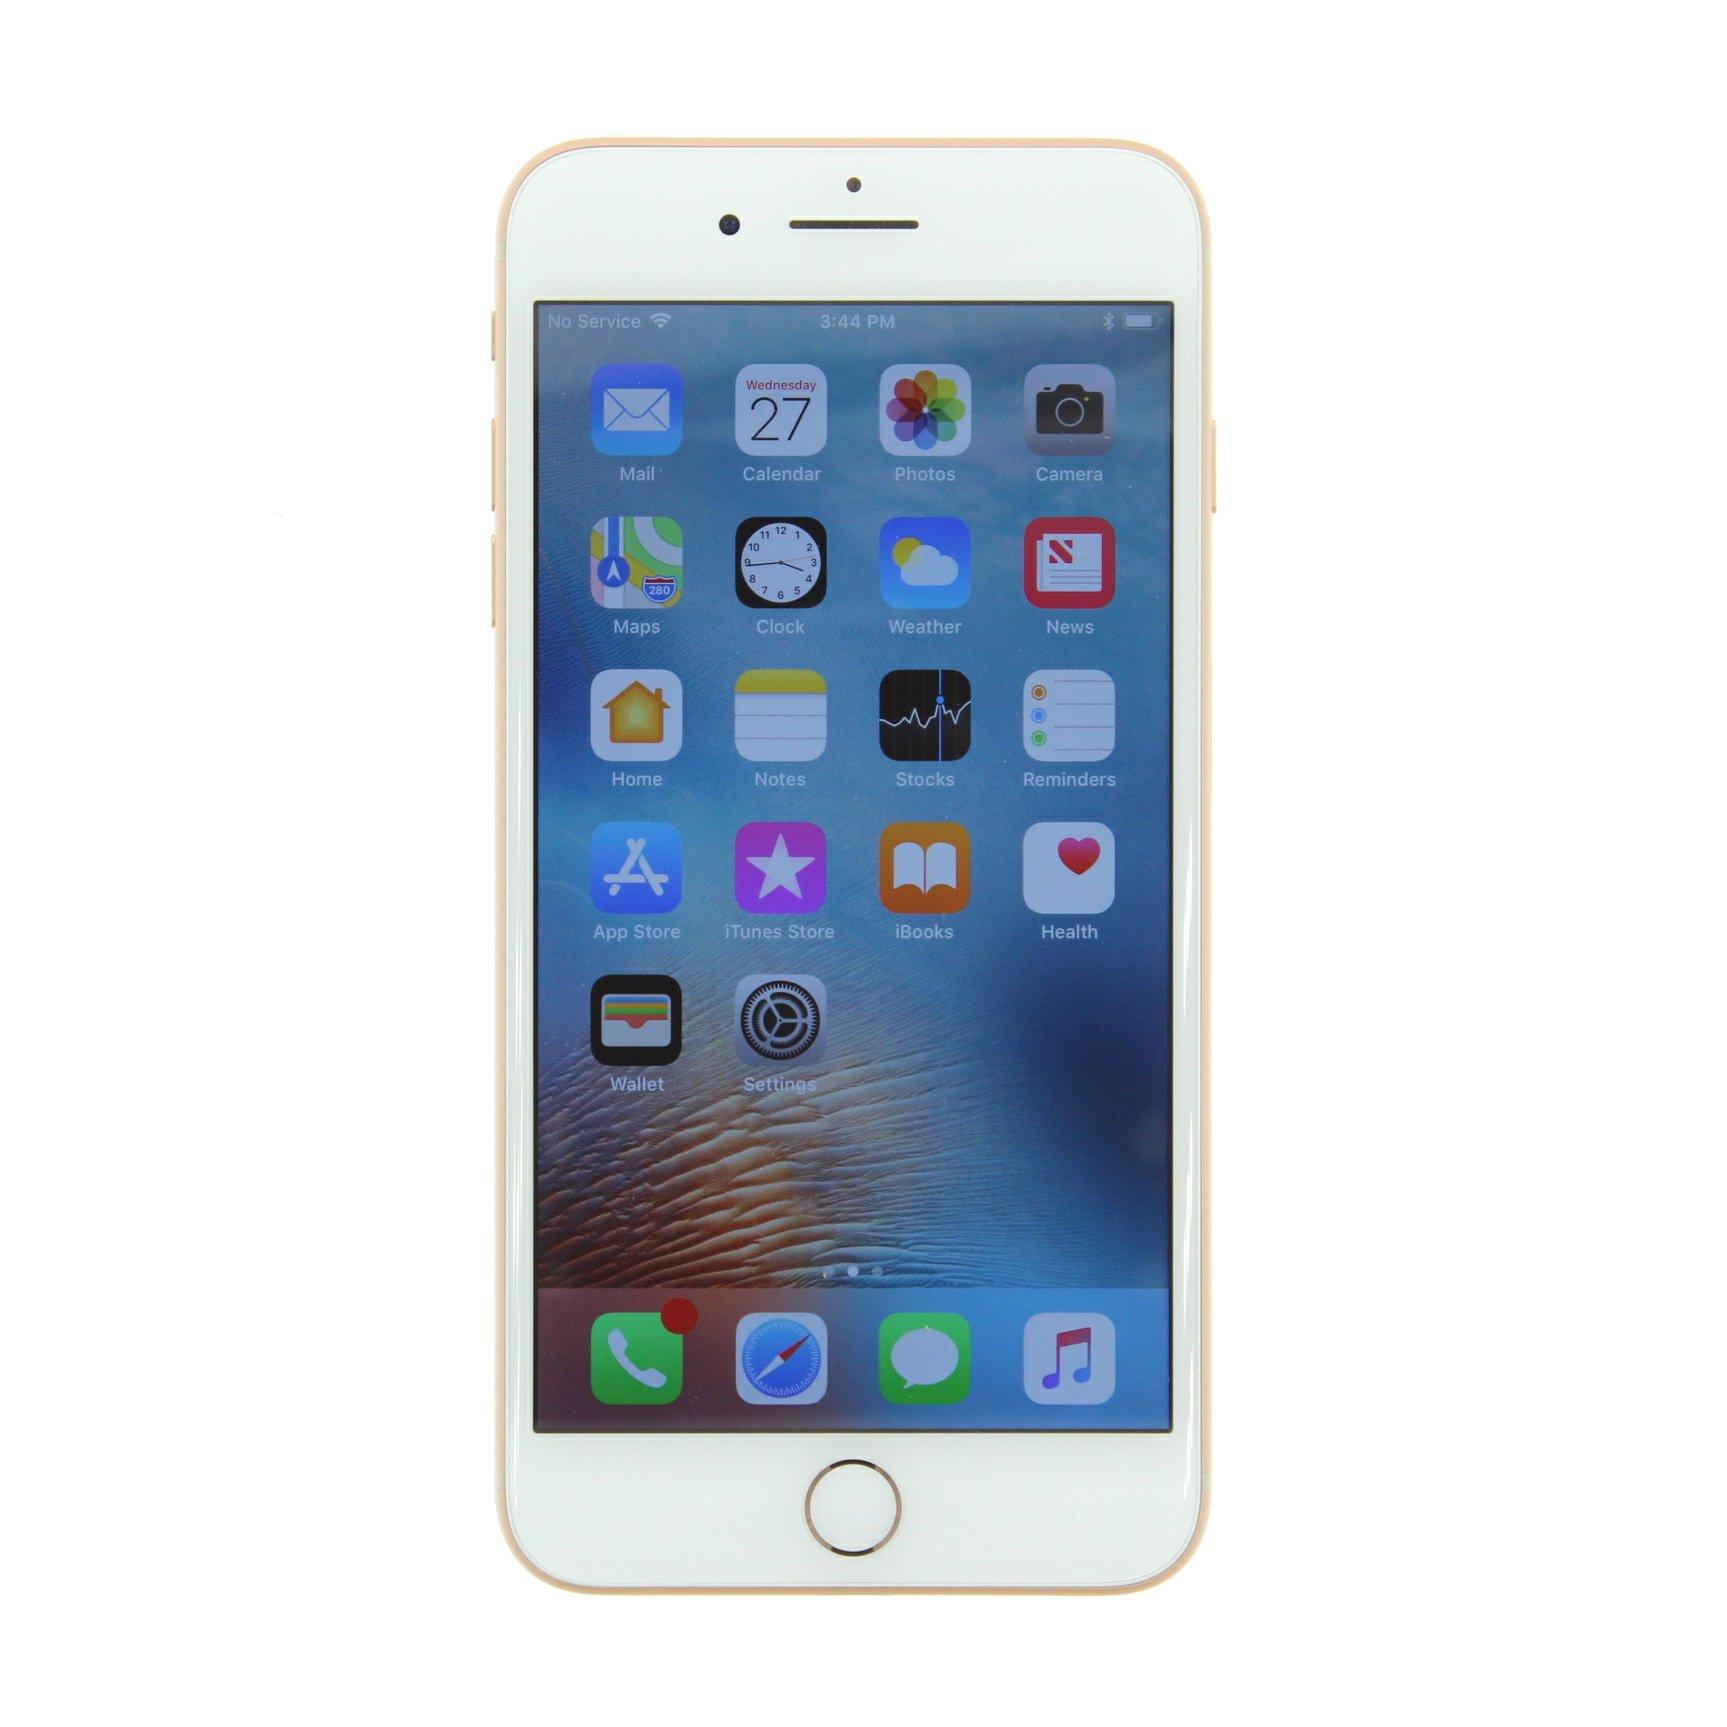 Apple iPhone 8 Plus a1897 Gold 64GB GSM Unlocked (Renewed) by Apple